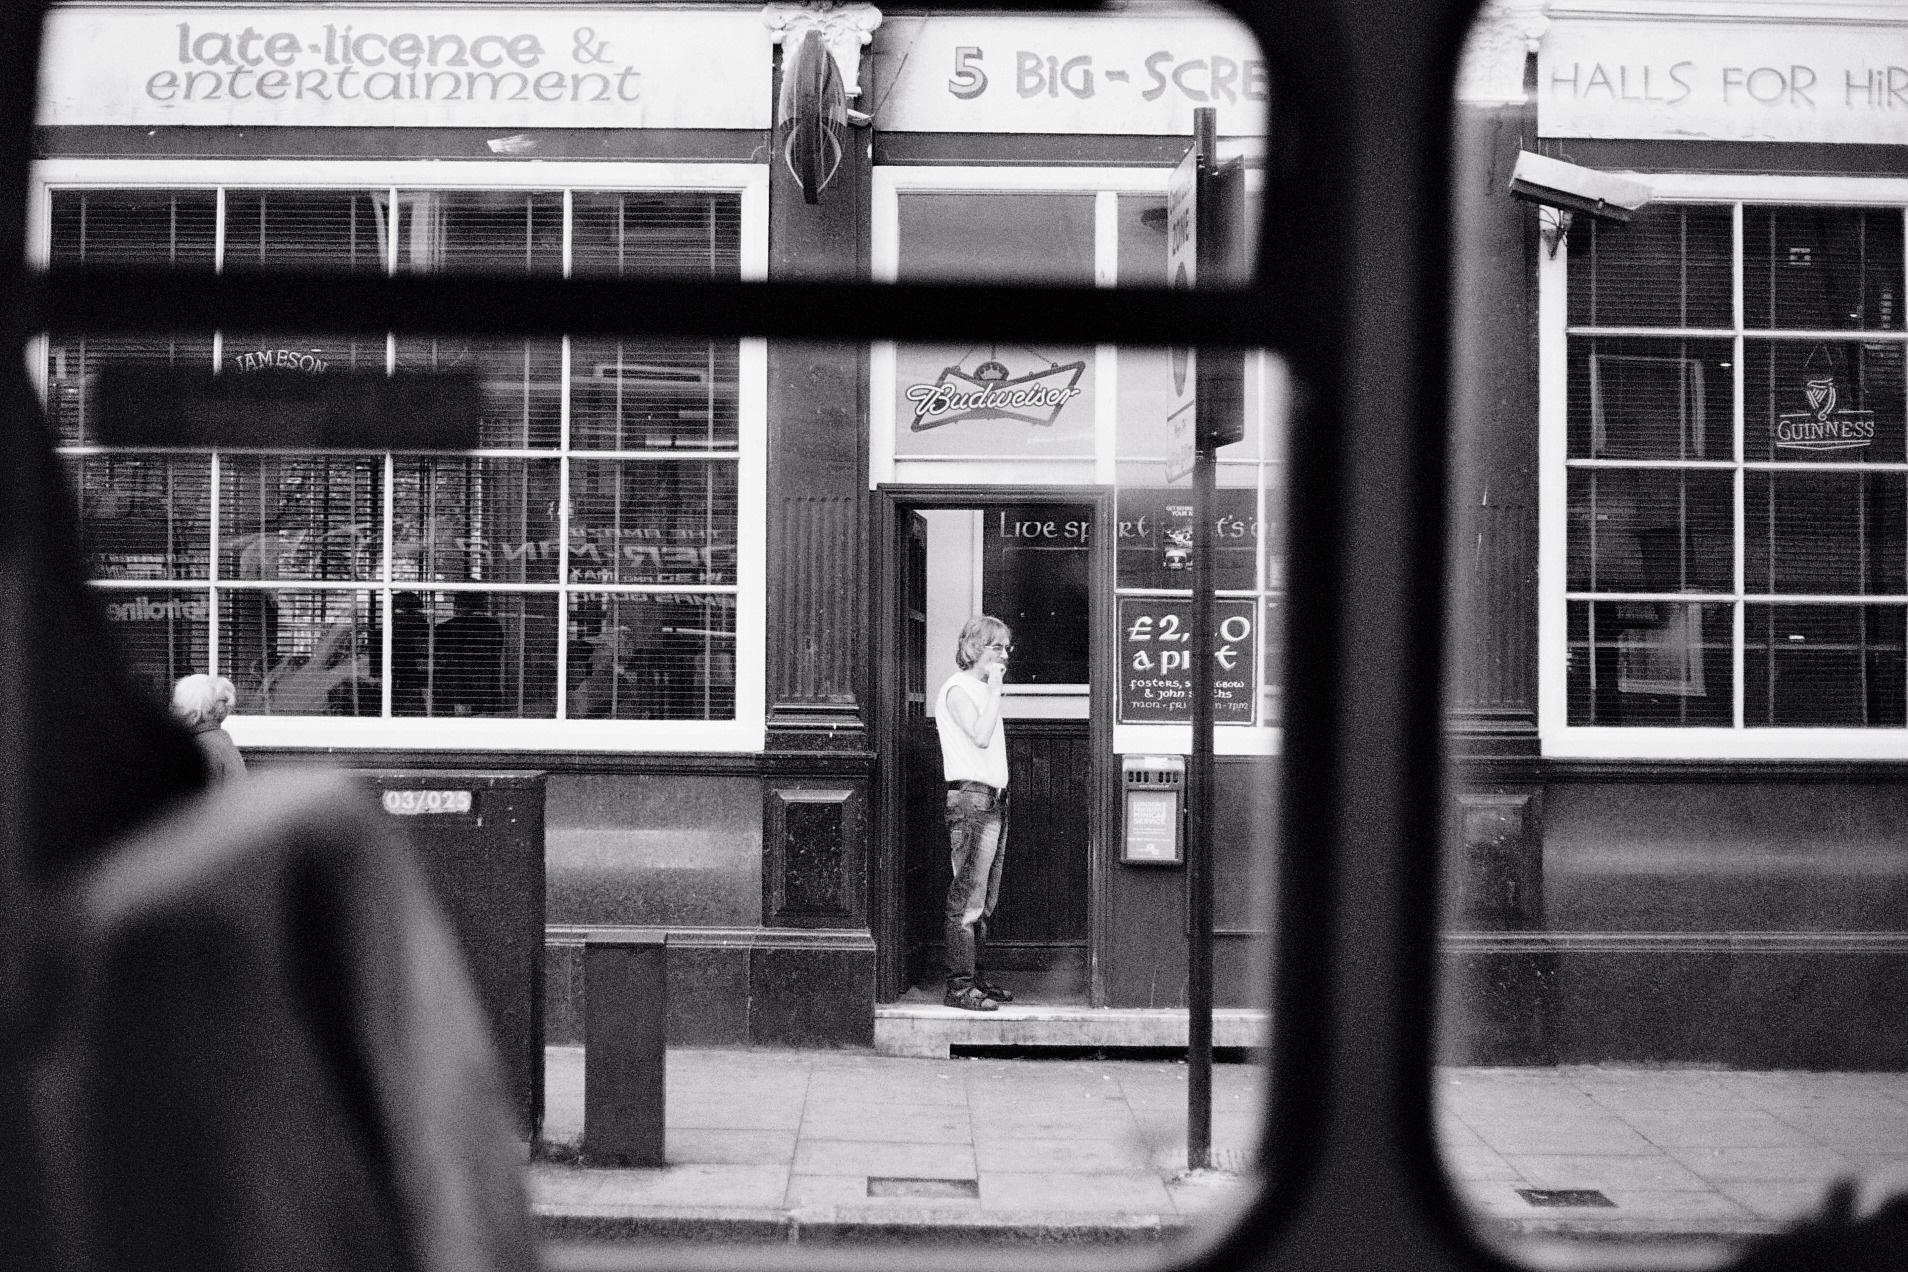 2014  - Londres, UK -  Camera  Canon EOS 1-N  Lens  Canon EF 16-35mm f/2.8 L  Film  Ilford XP2